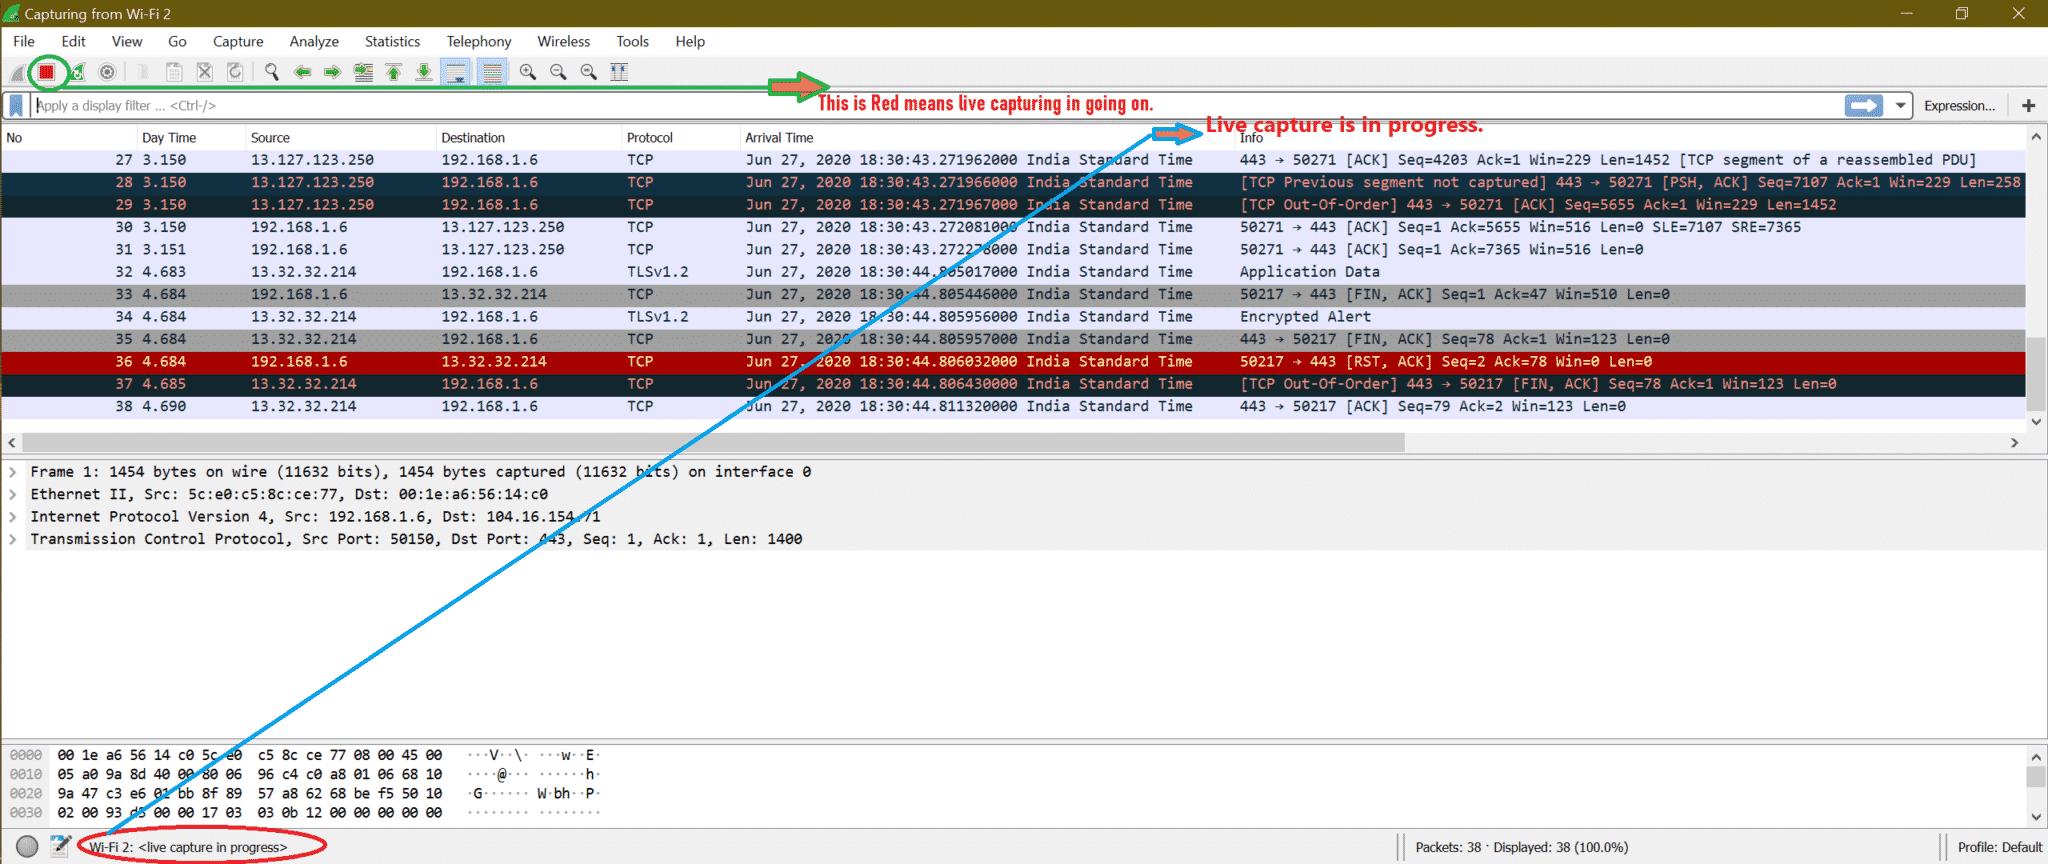 E:fiverrWorkLinuxhint_mail74838BOOK - Linux Forensics Tools & Techniquespiclive_cap.png